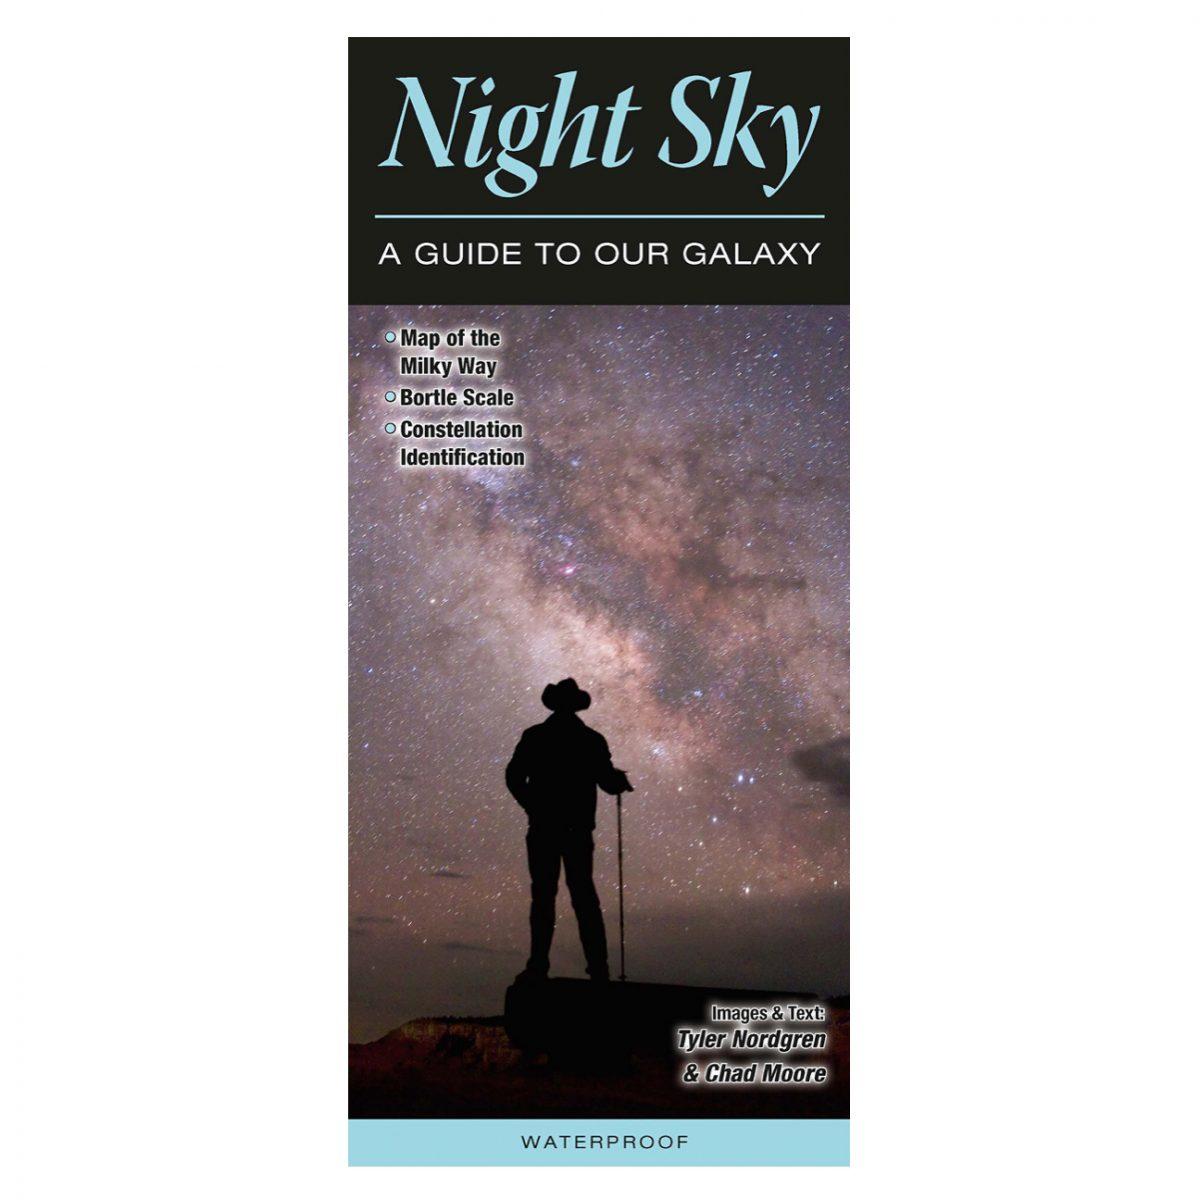 AIRMKT eCom Tyler Nordgren Night Sky WEB